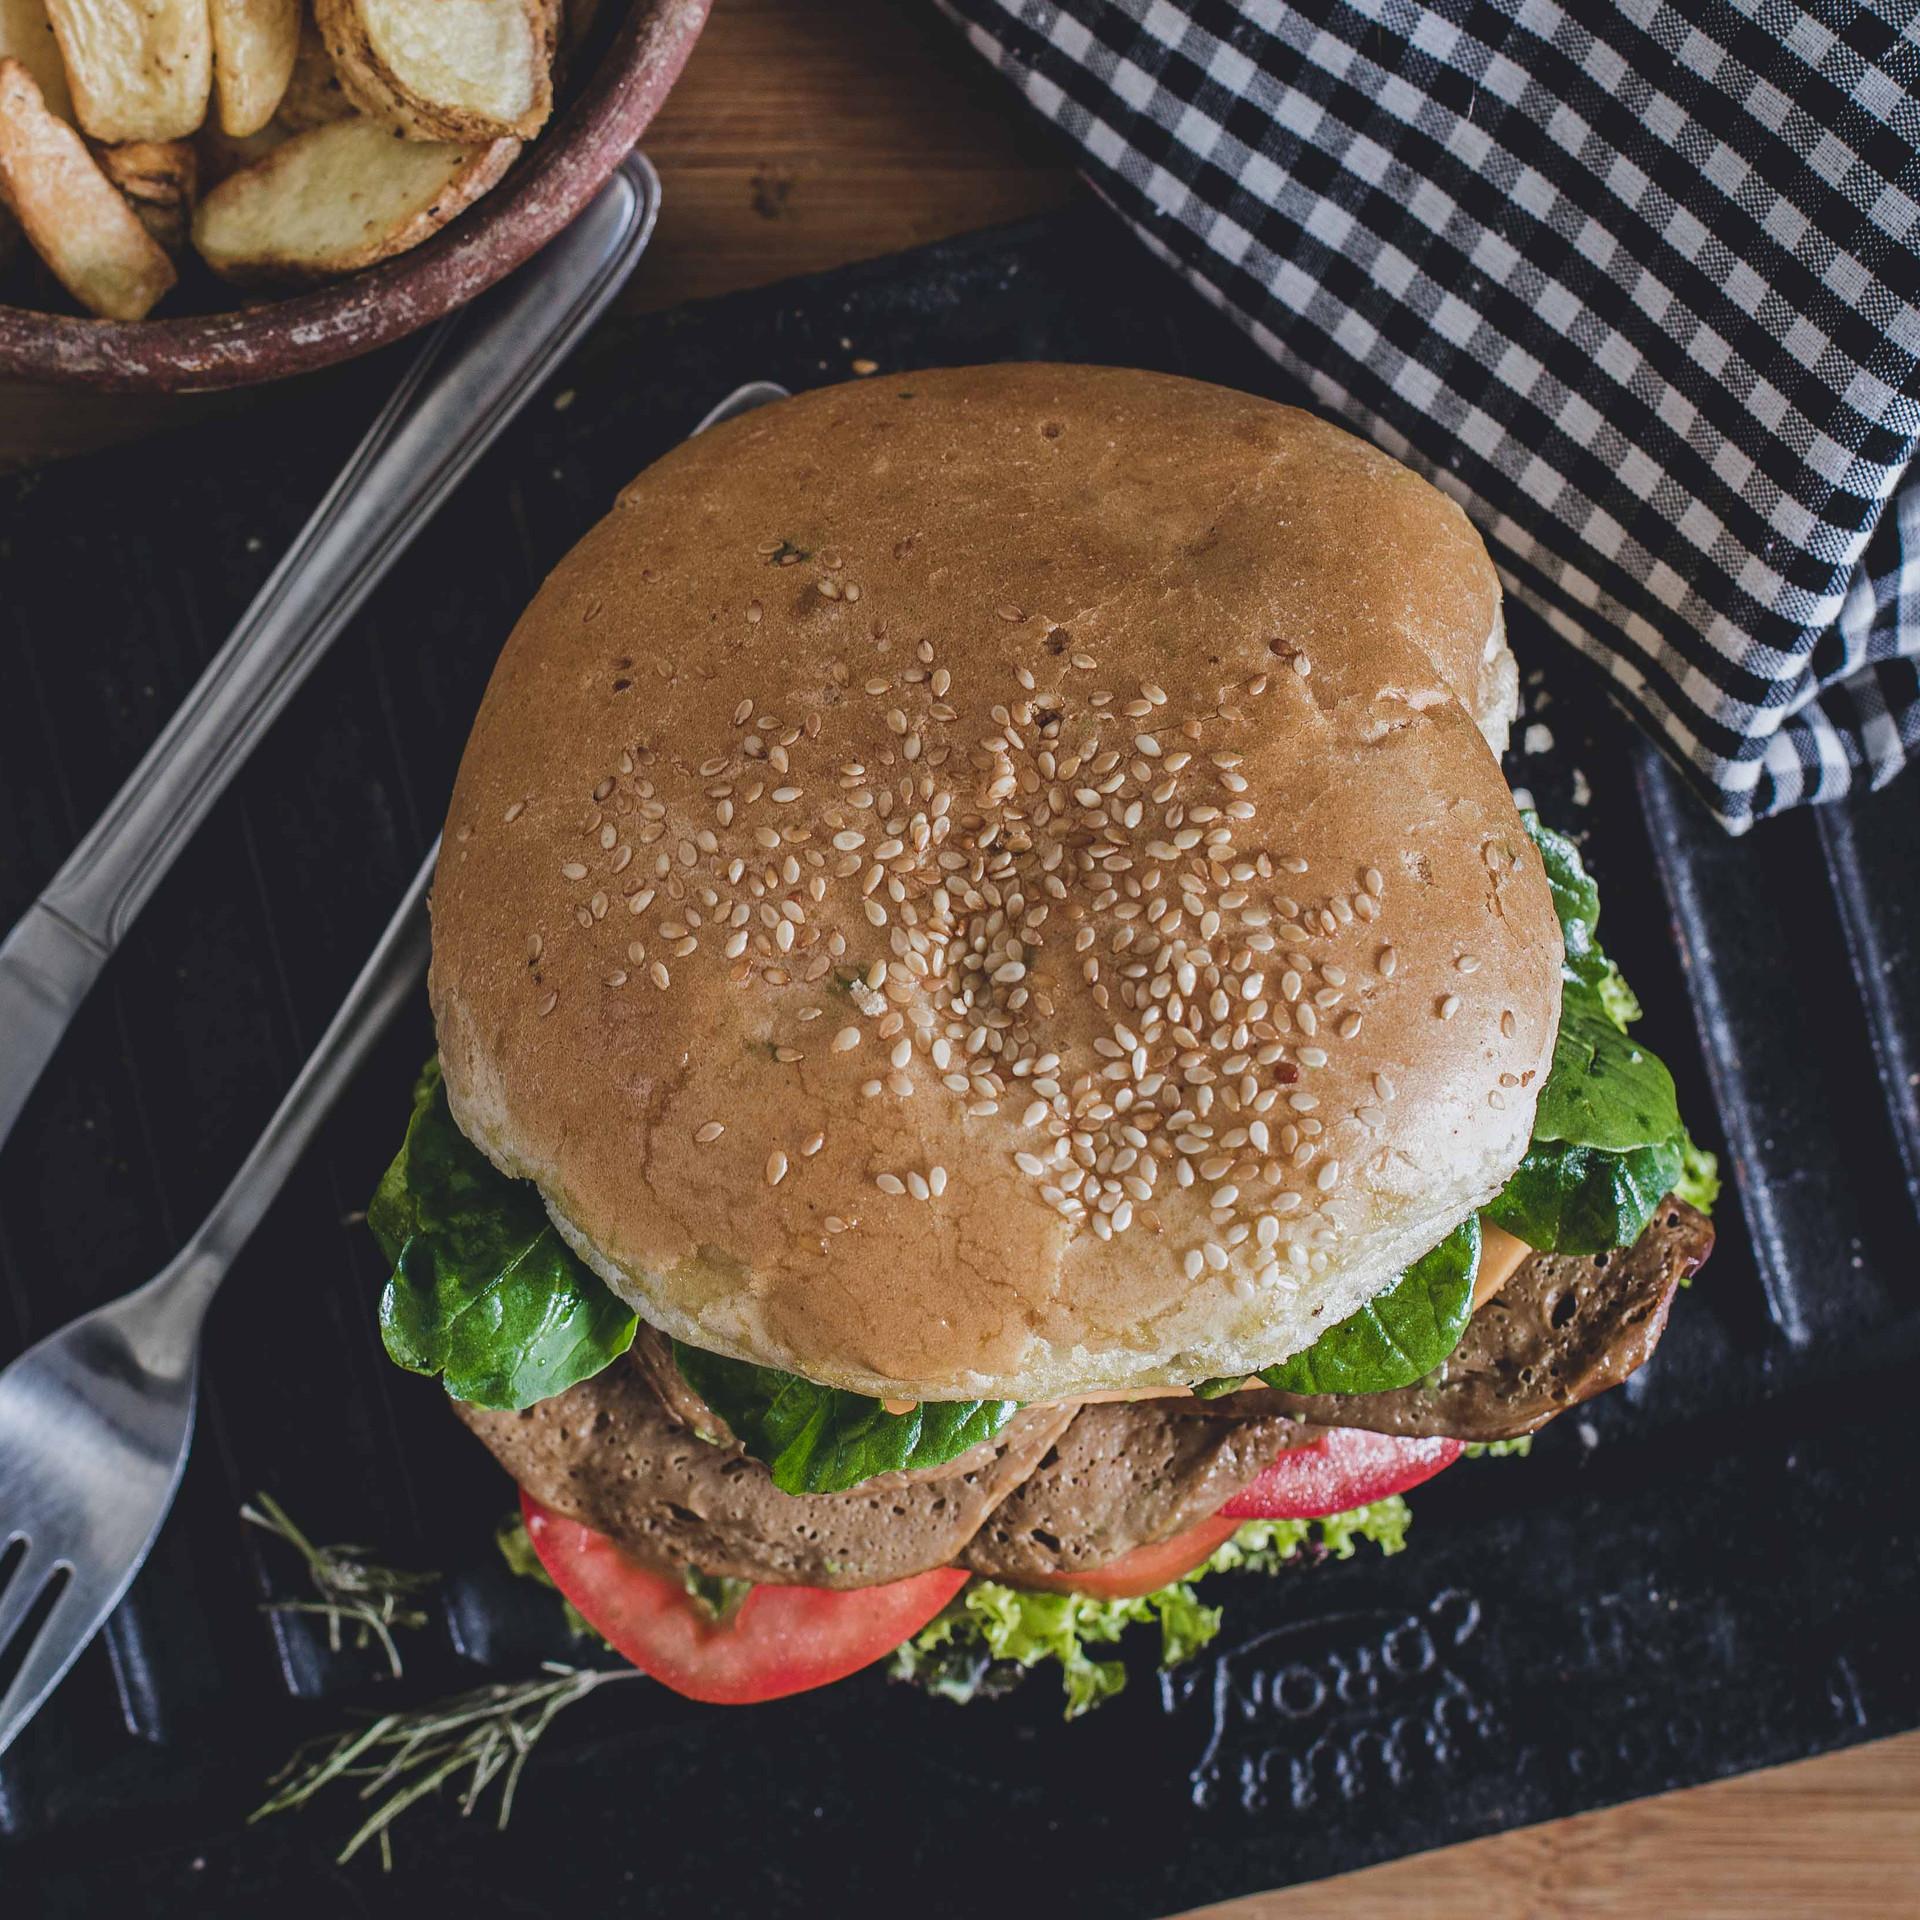 foodstyling - claudiography.com -  Fotografía Publicitaria - Hamburguesa Seitán